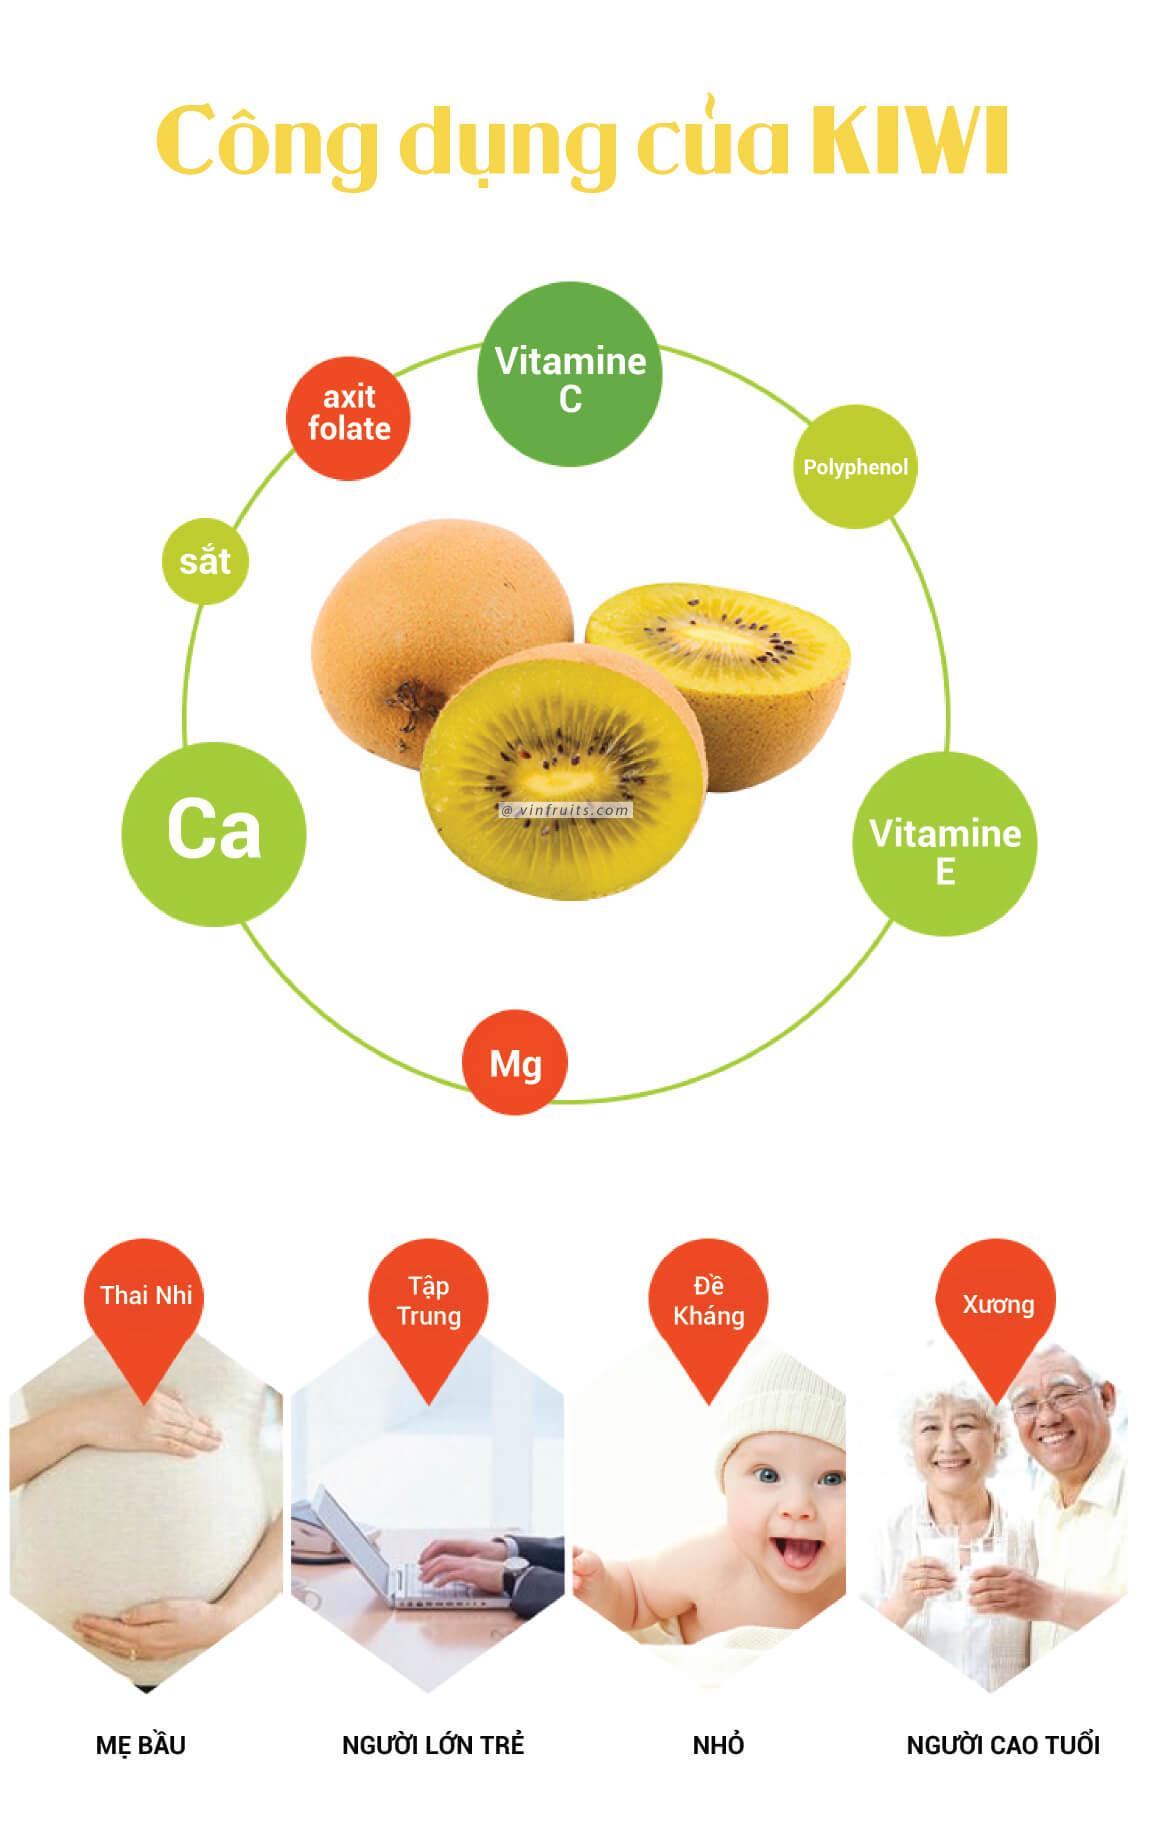 Dinh duong qua kiwi vang - vinfruits